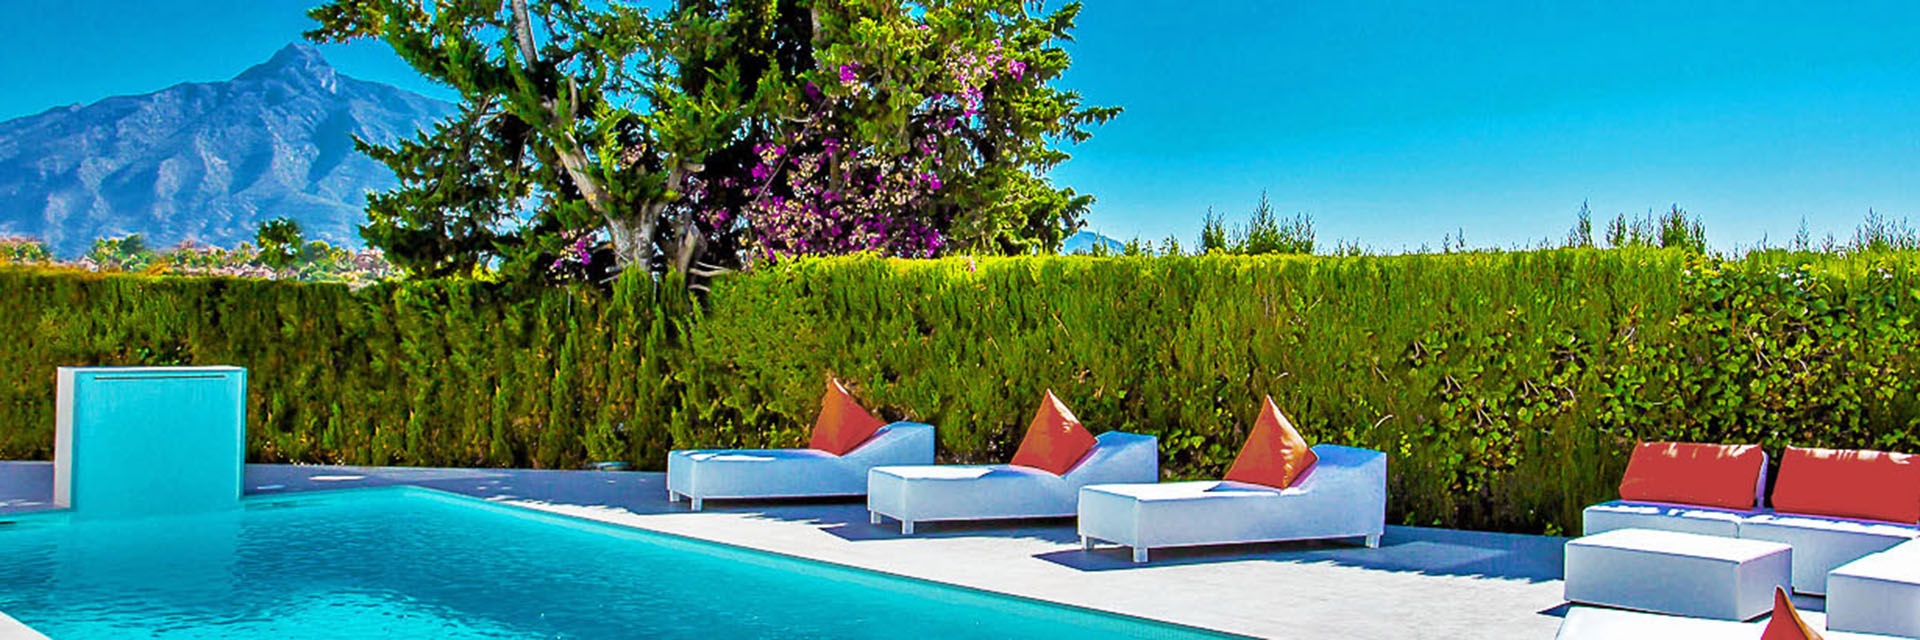 Stylish Puerto Banus pool with views in Marbella